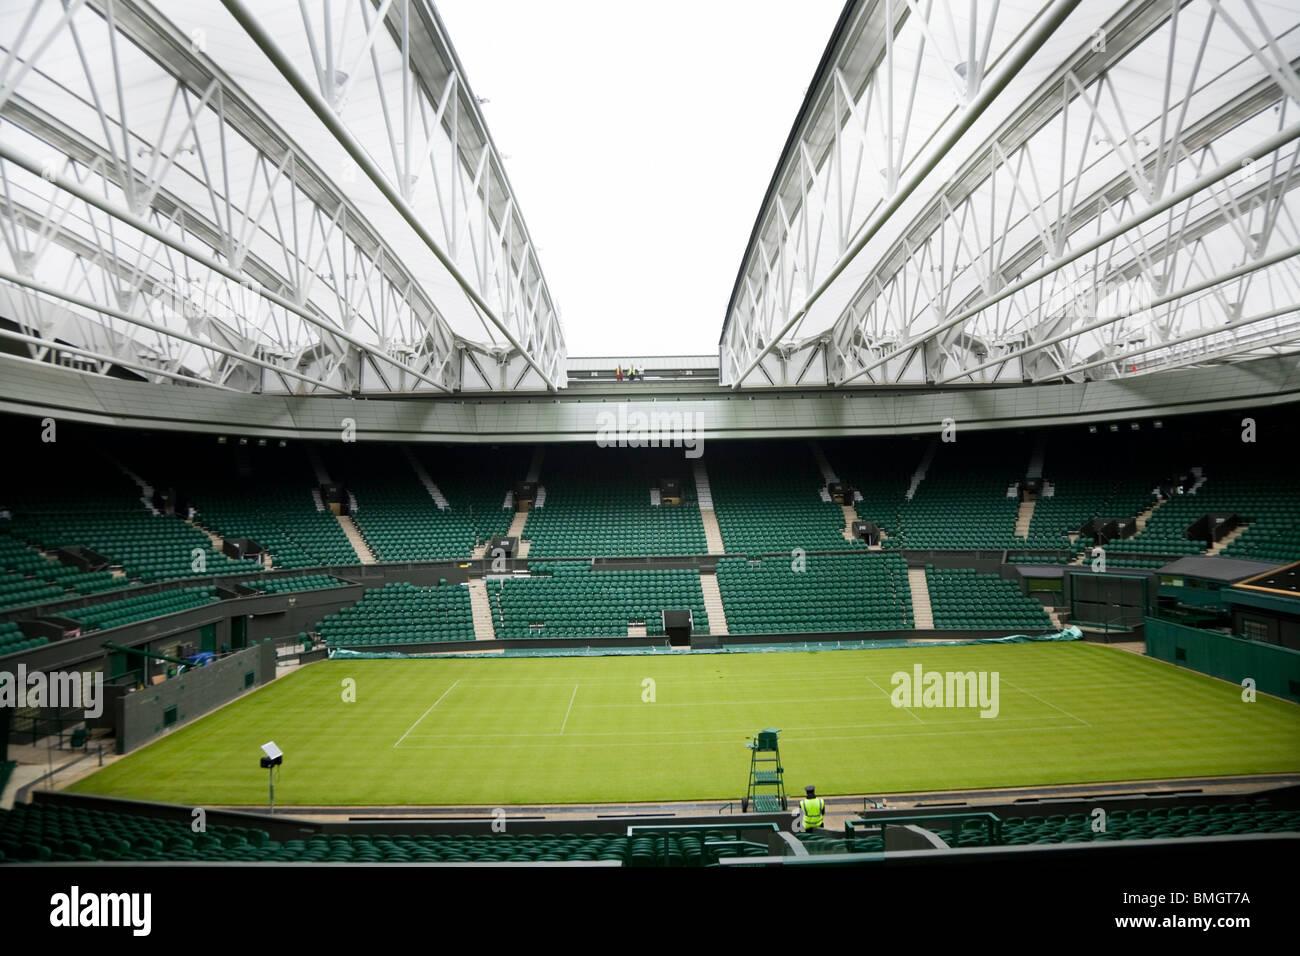 Centre Court Wimbledon Tennis Championship Stadium Arena